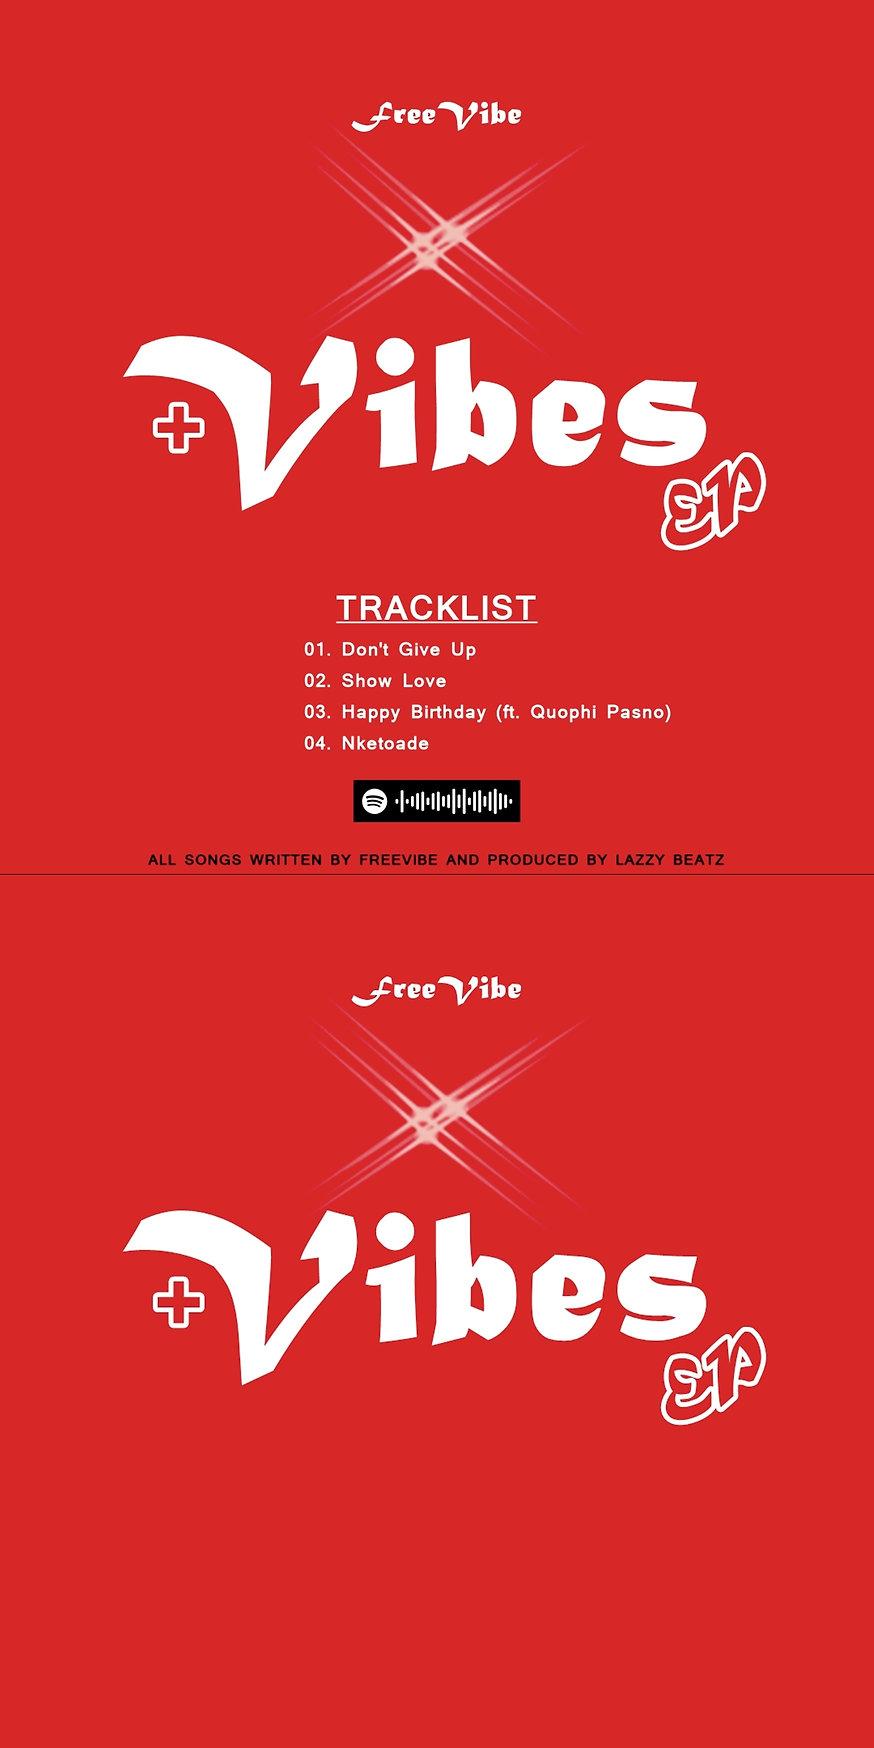 Tracklist-vert.jpg